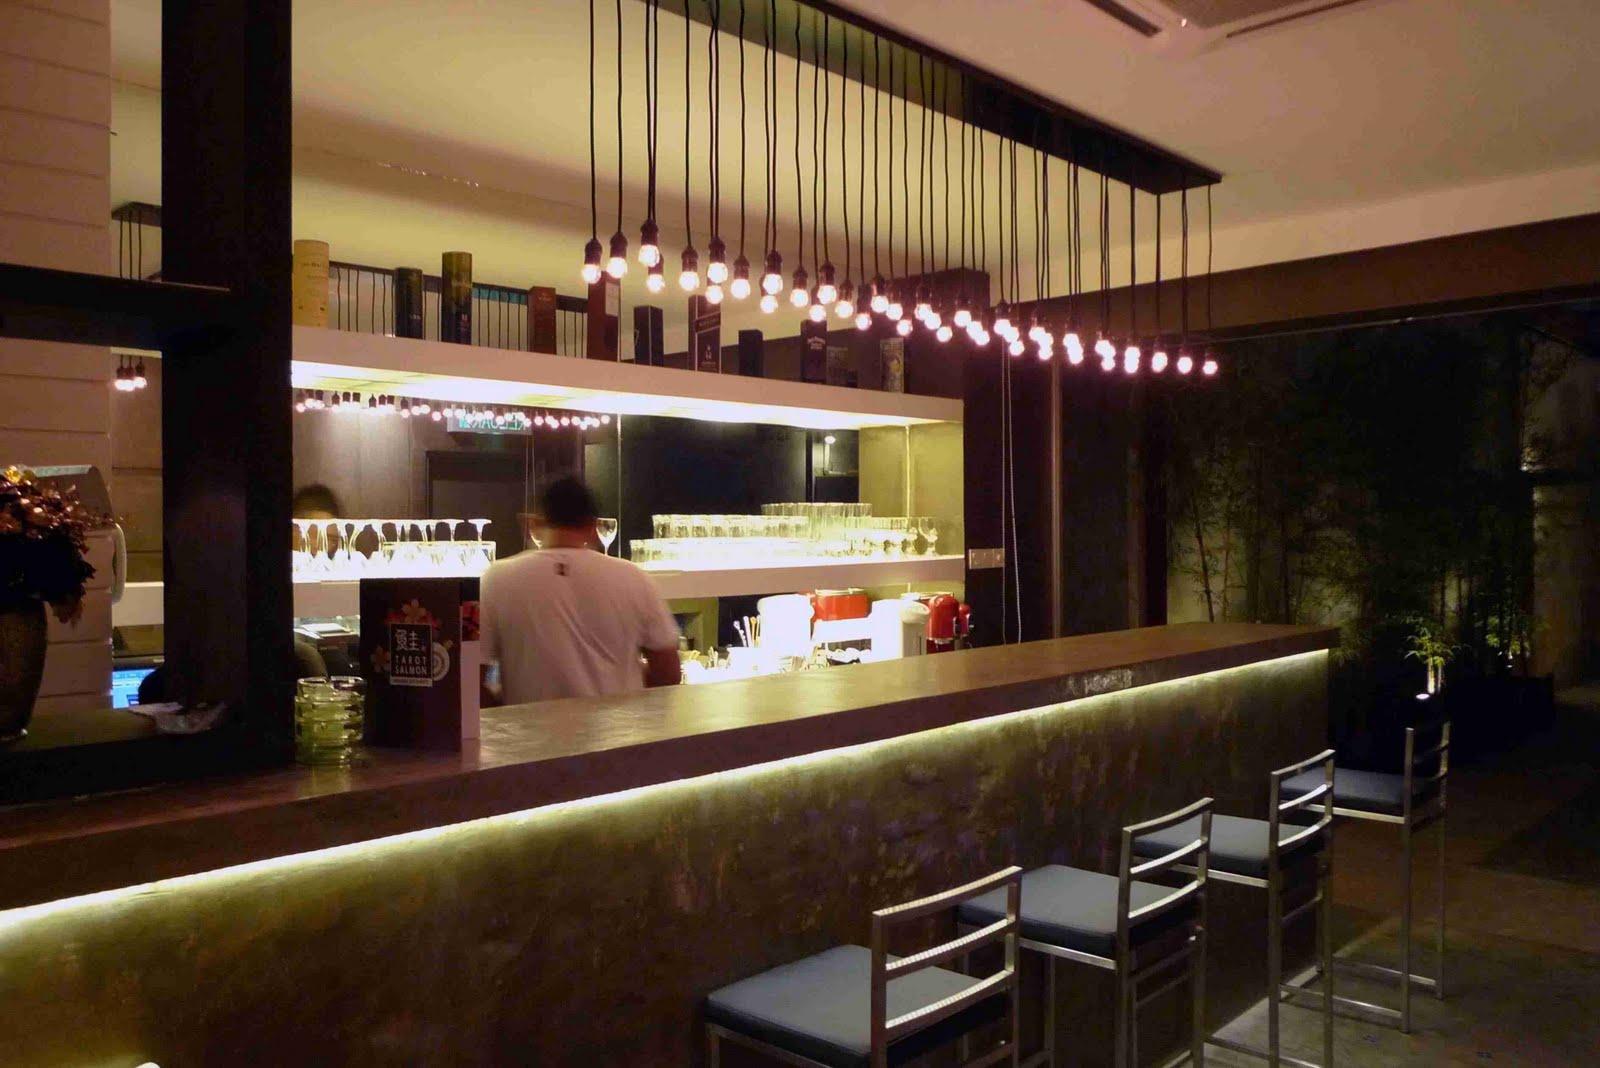 kuching hotels batik boutique hotel boutique reception counter